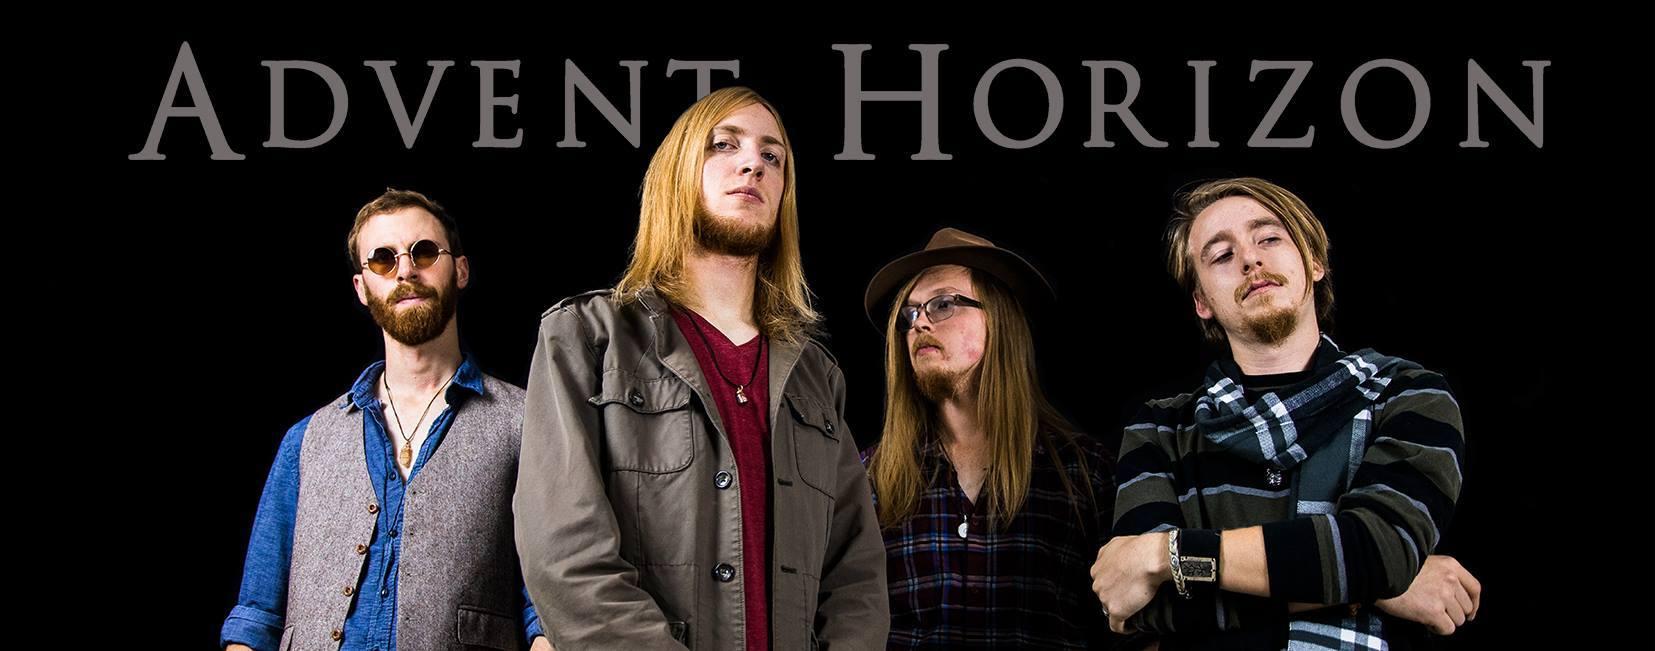 advent horizon at the Powder Keg